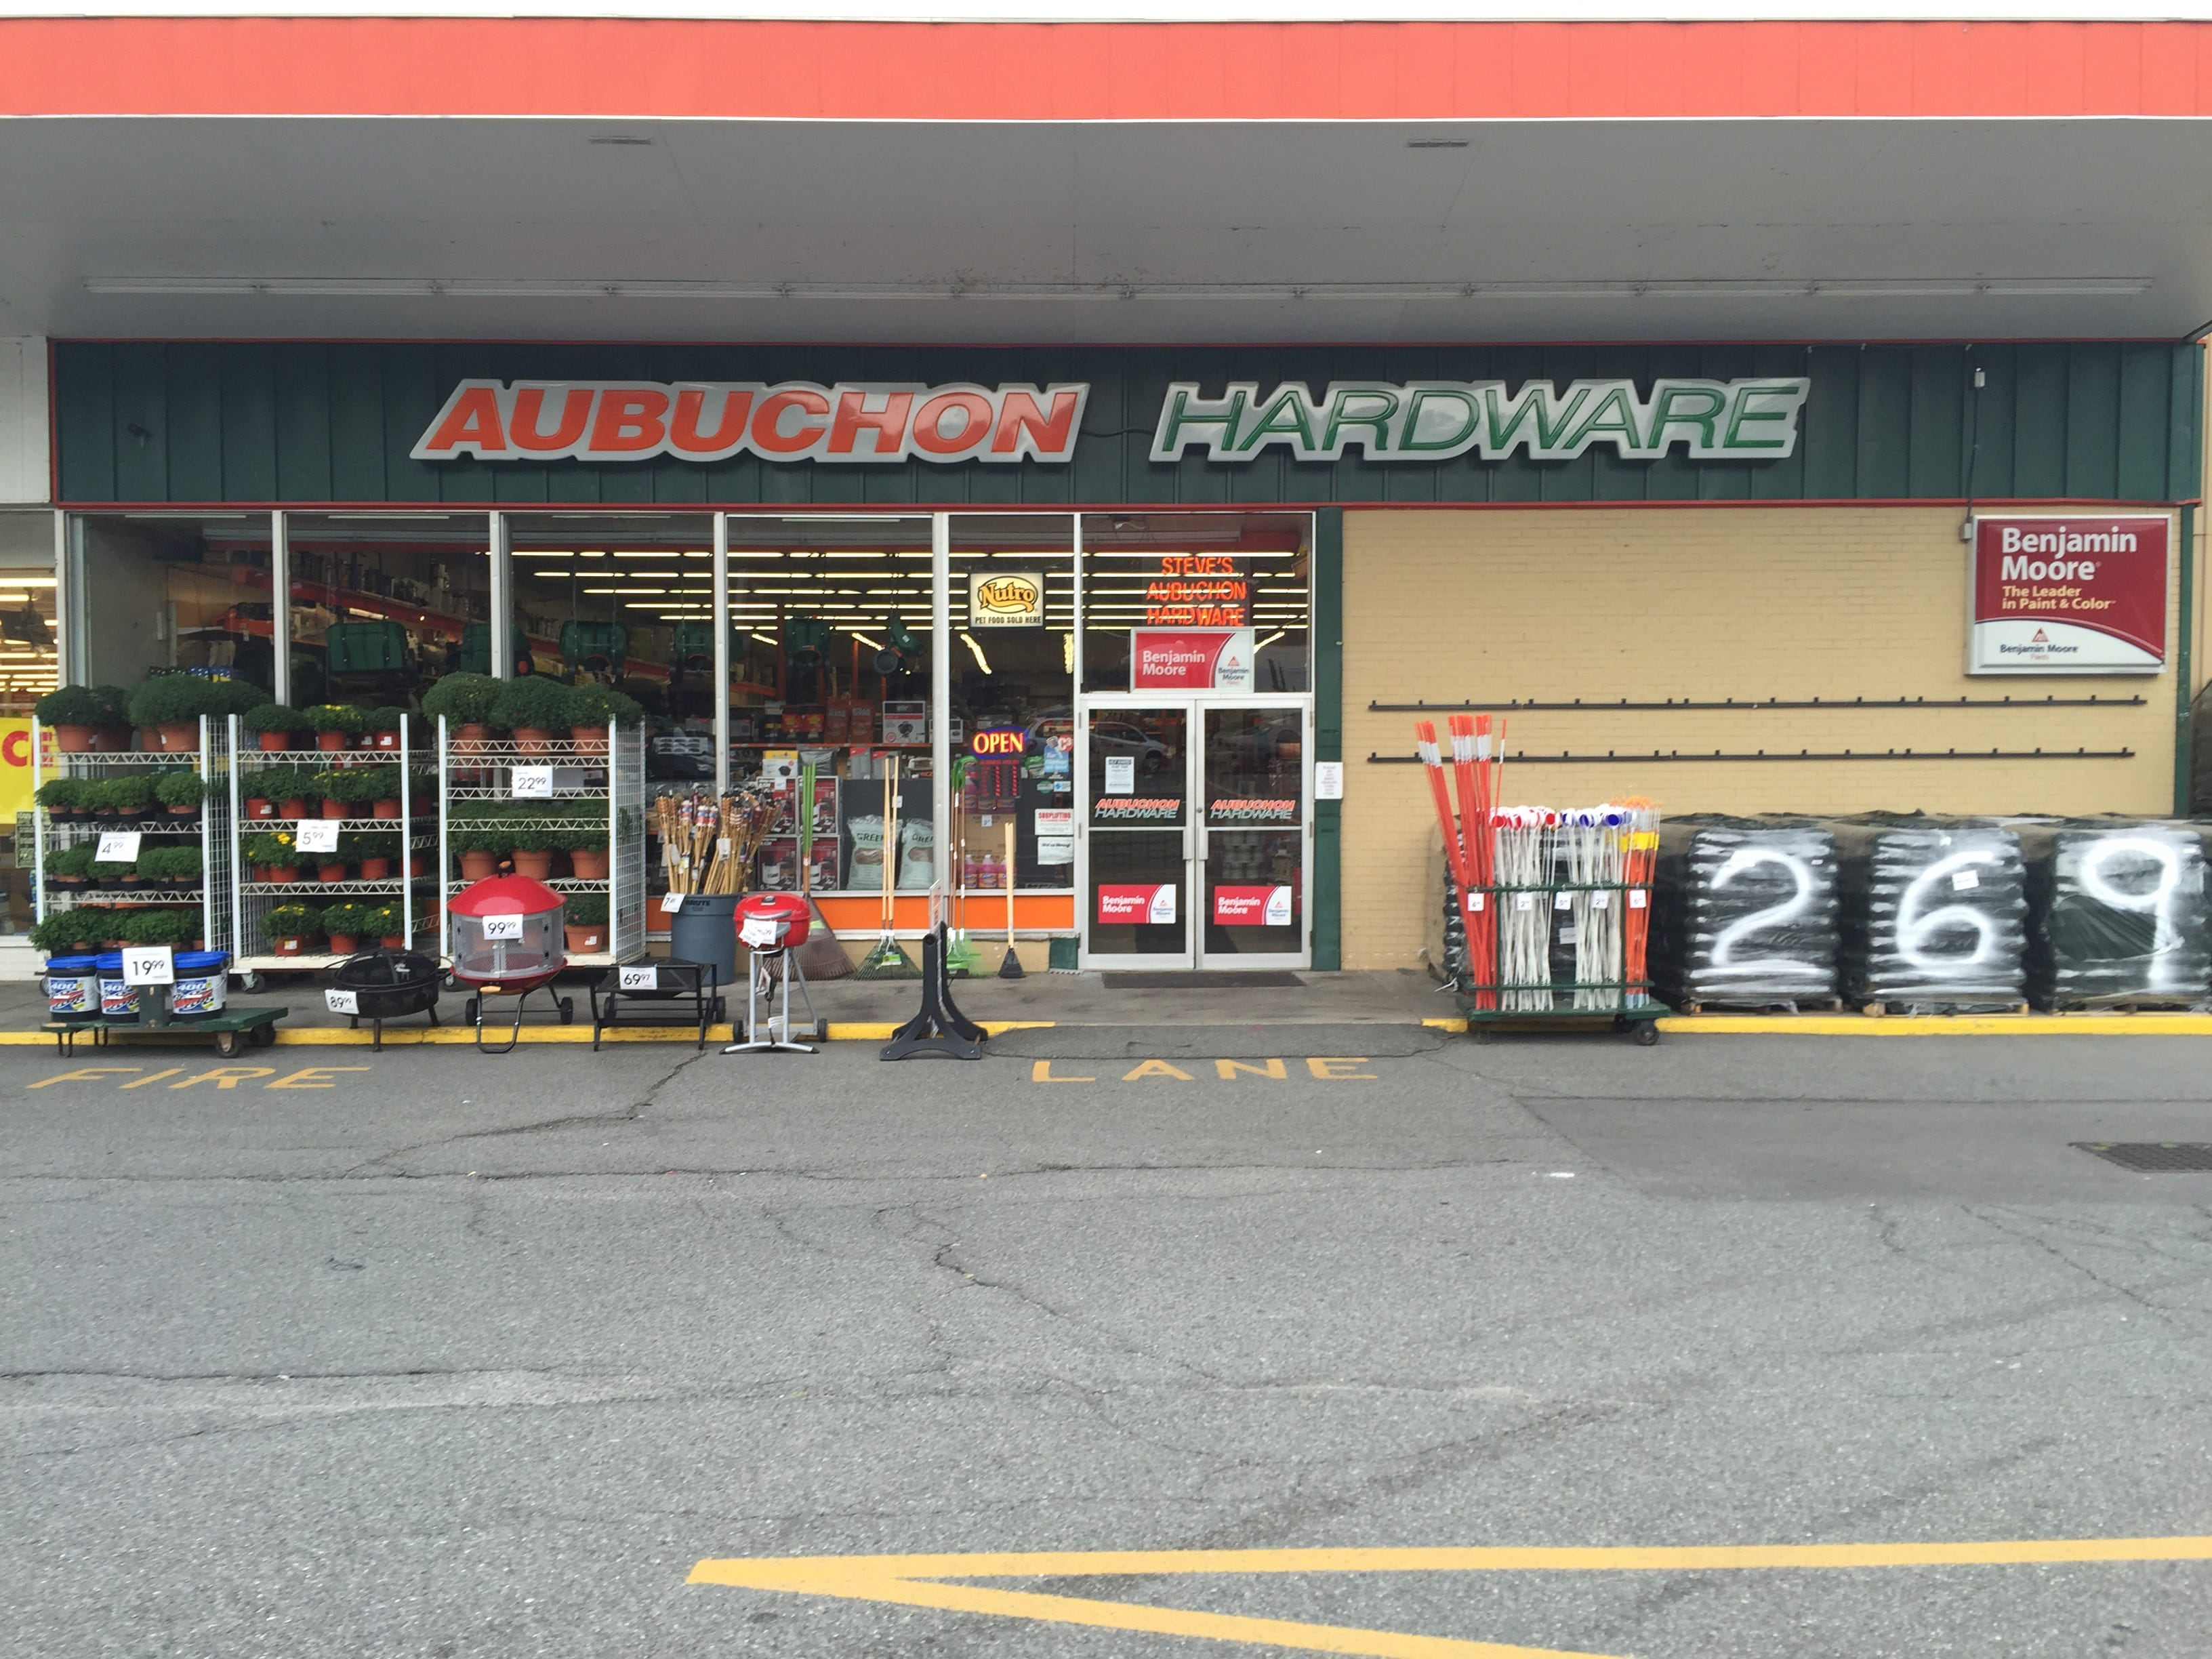 Aubuchon Hardware : 017 Turners Falls, MA